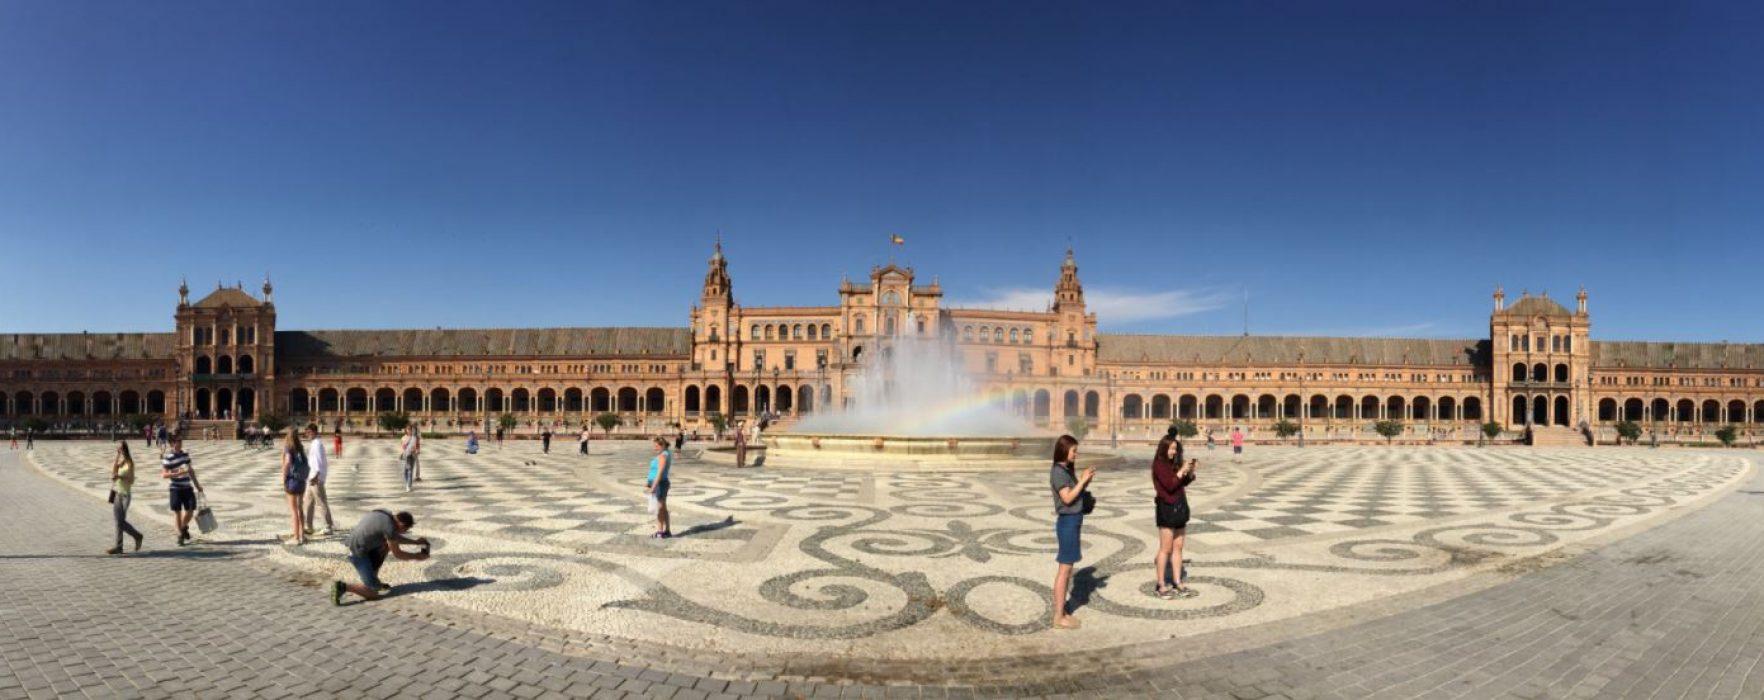 Así es vivir a 5 minutos de la emblemática Plaza de España de Sevilla